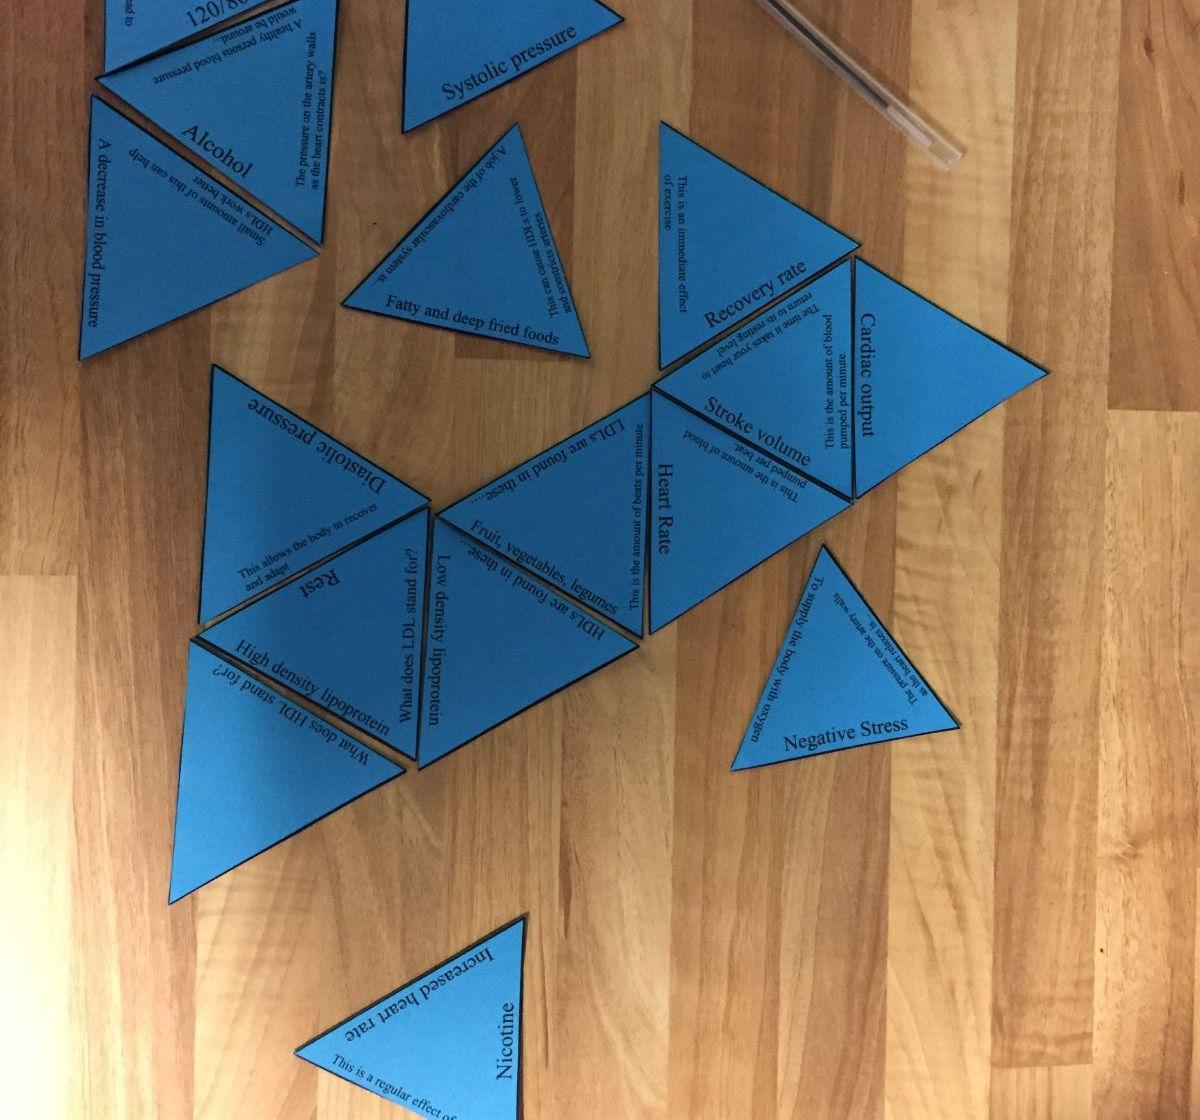 GCSE PE AQA 9-1 Full Paper 1 Tarsia Triangle Puzzle Set